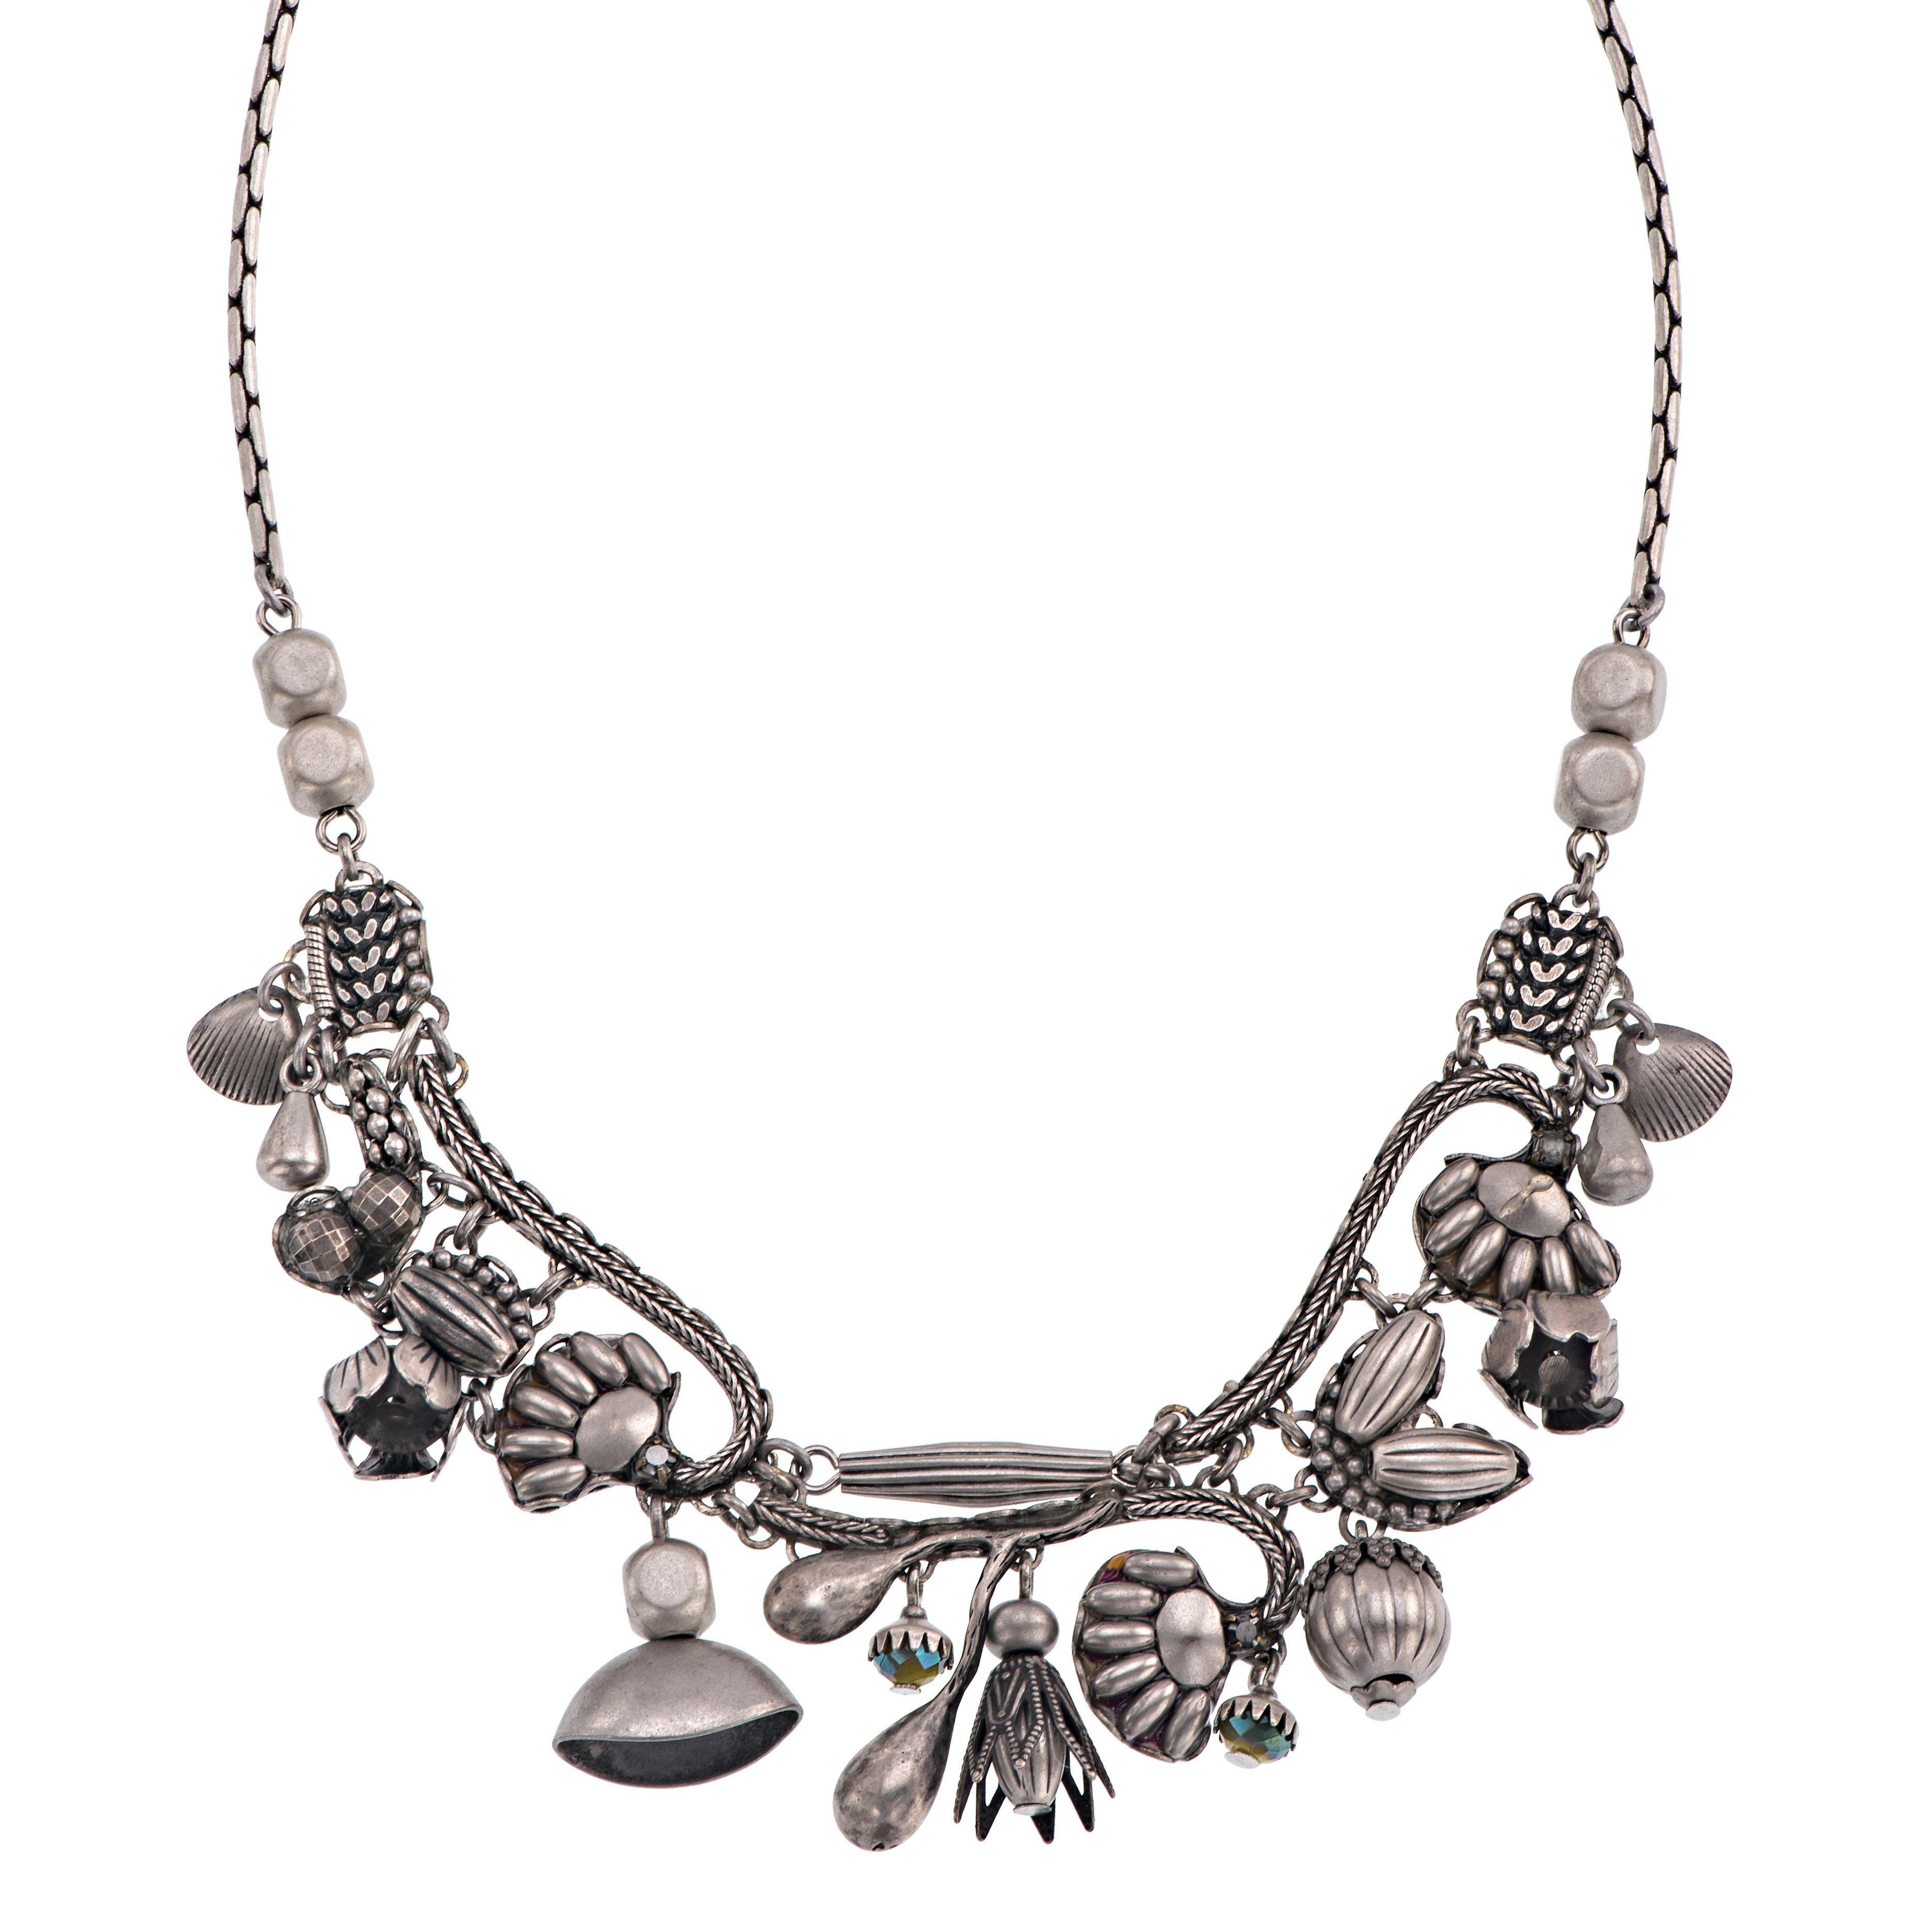 Sagittarius Classica Necklace Ayala Bar Indigo Collection Winter 2015 16 Handmade Fashion Jewelry Fashion Accessories Jewelry Fashion Jewelry